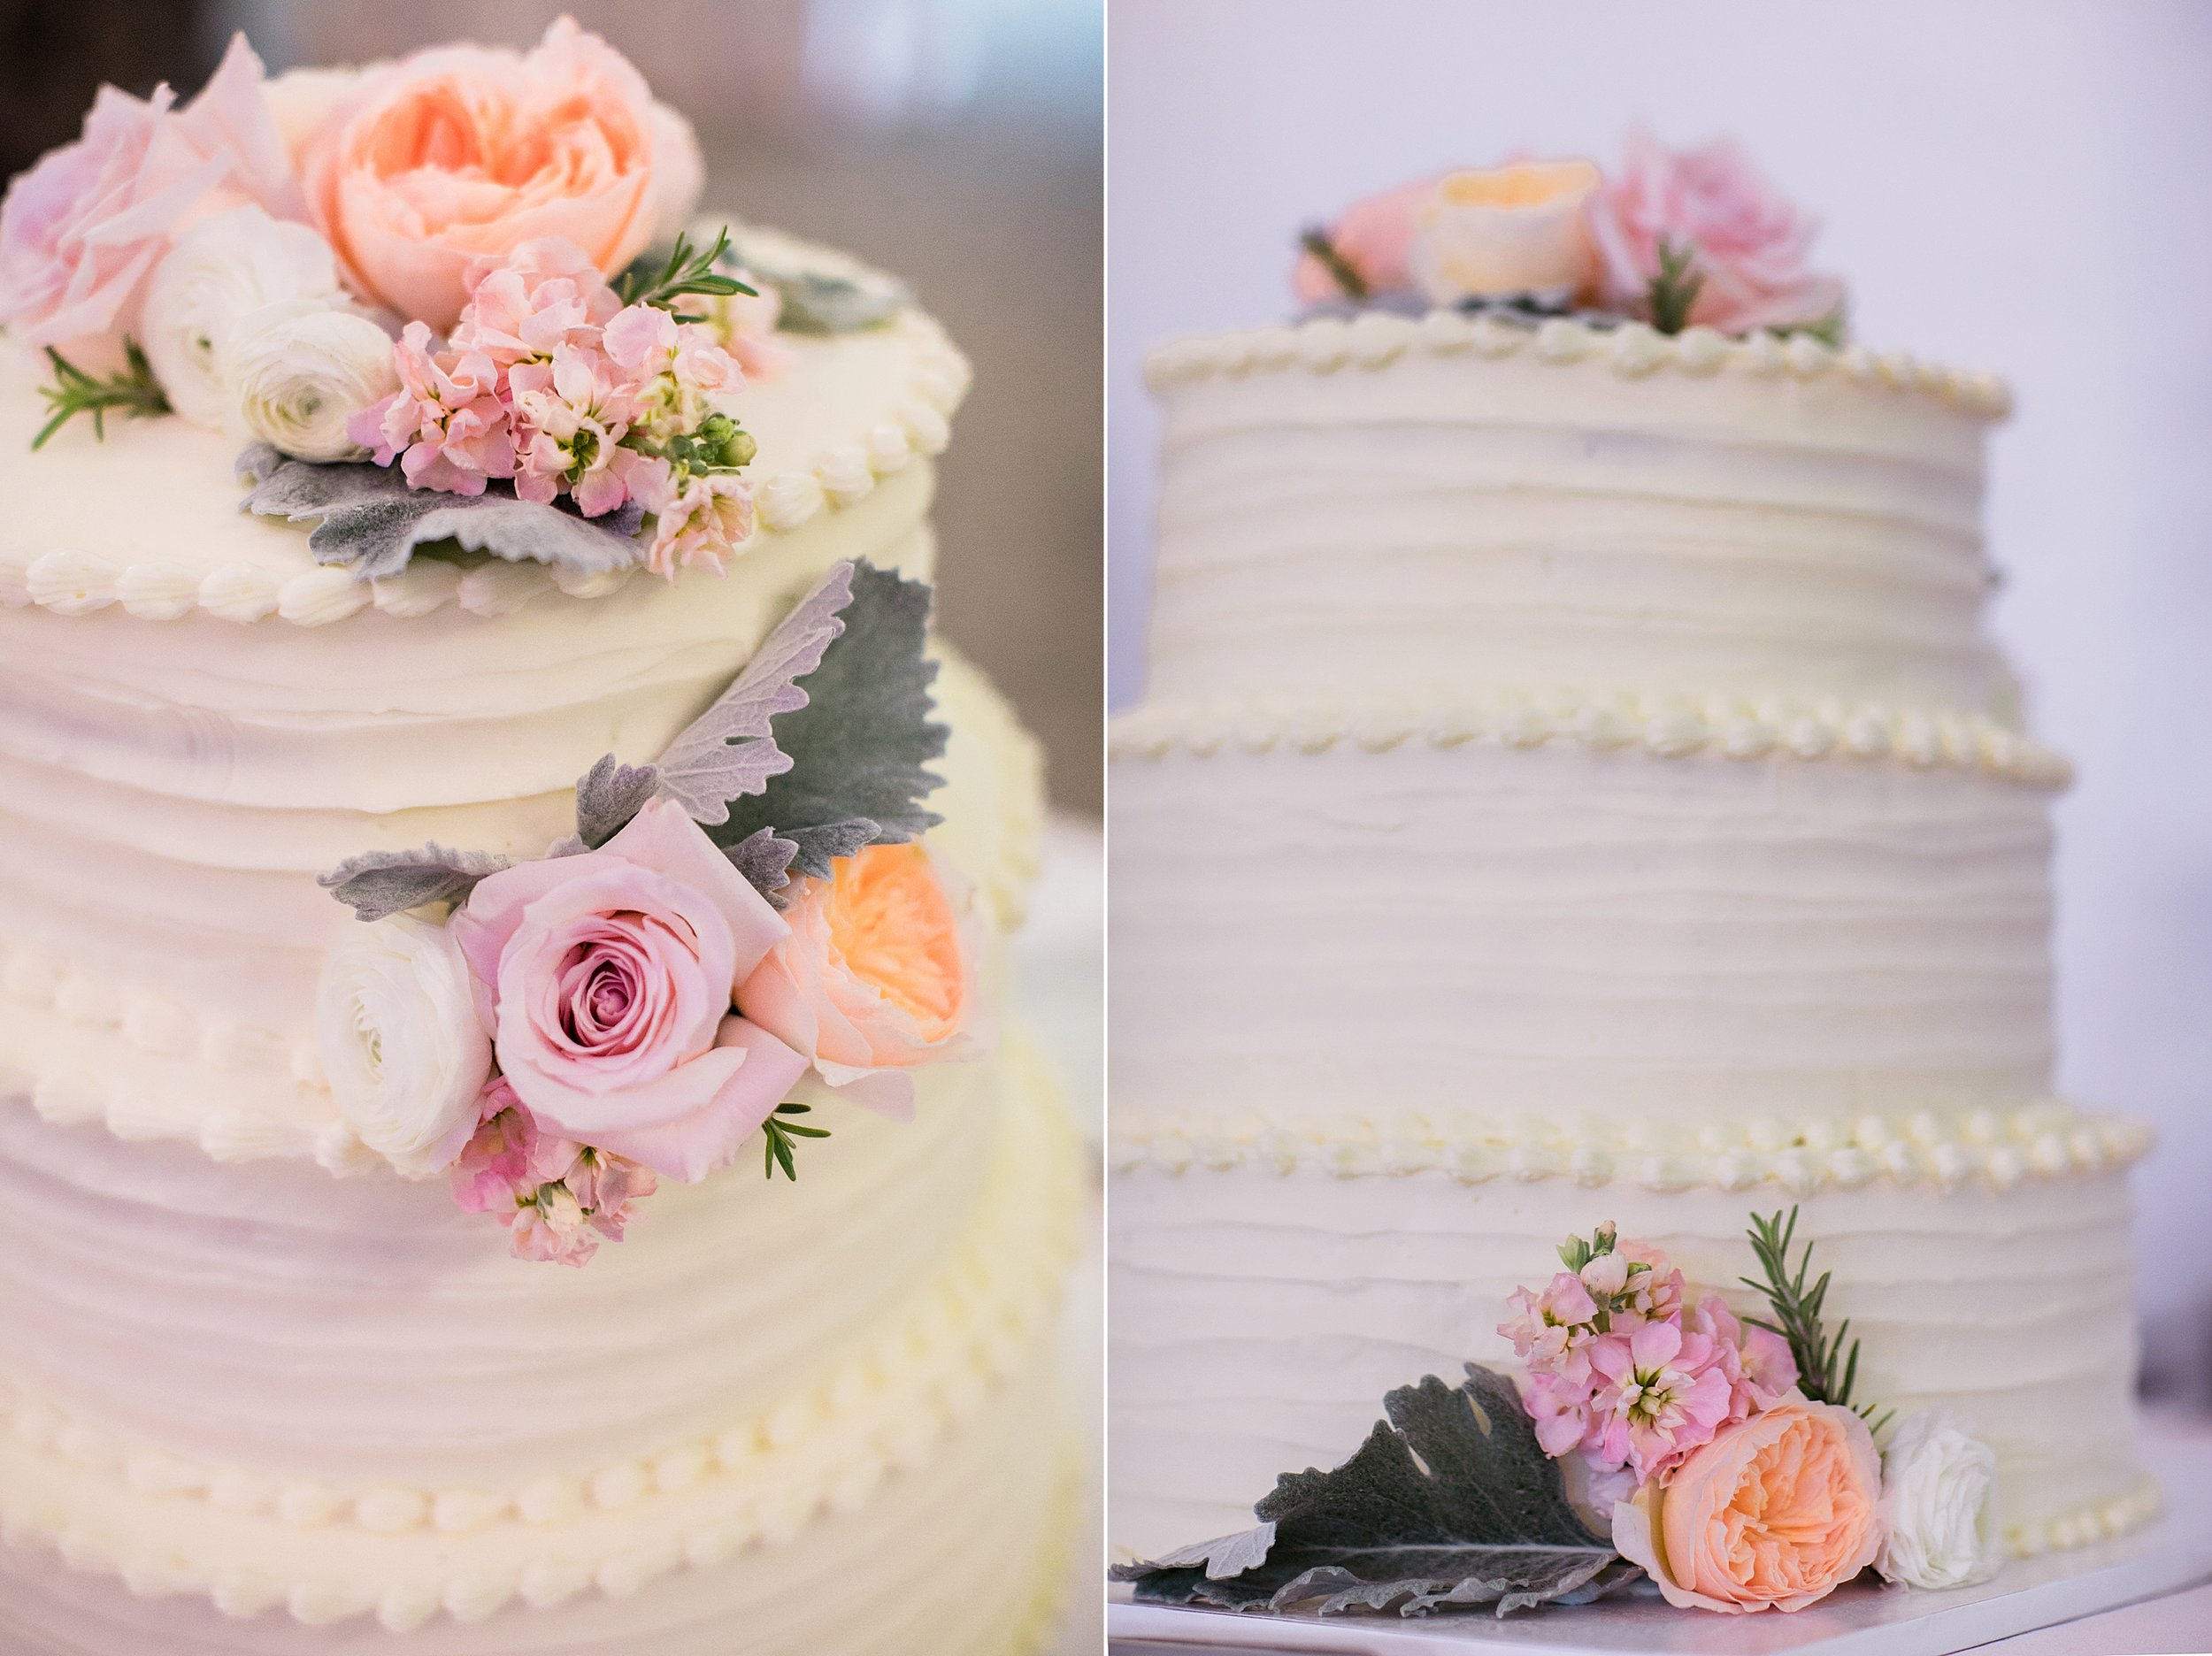 040 los angeles wedding photographer todd danforth photography boston.jpg